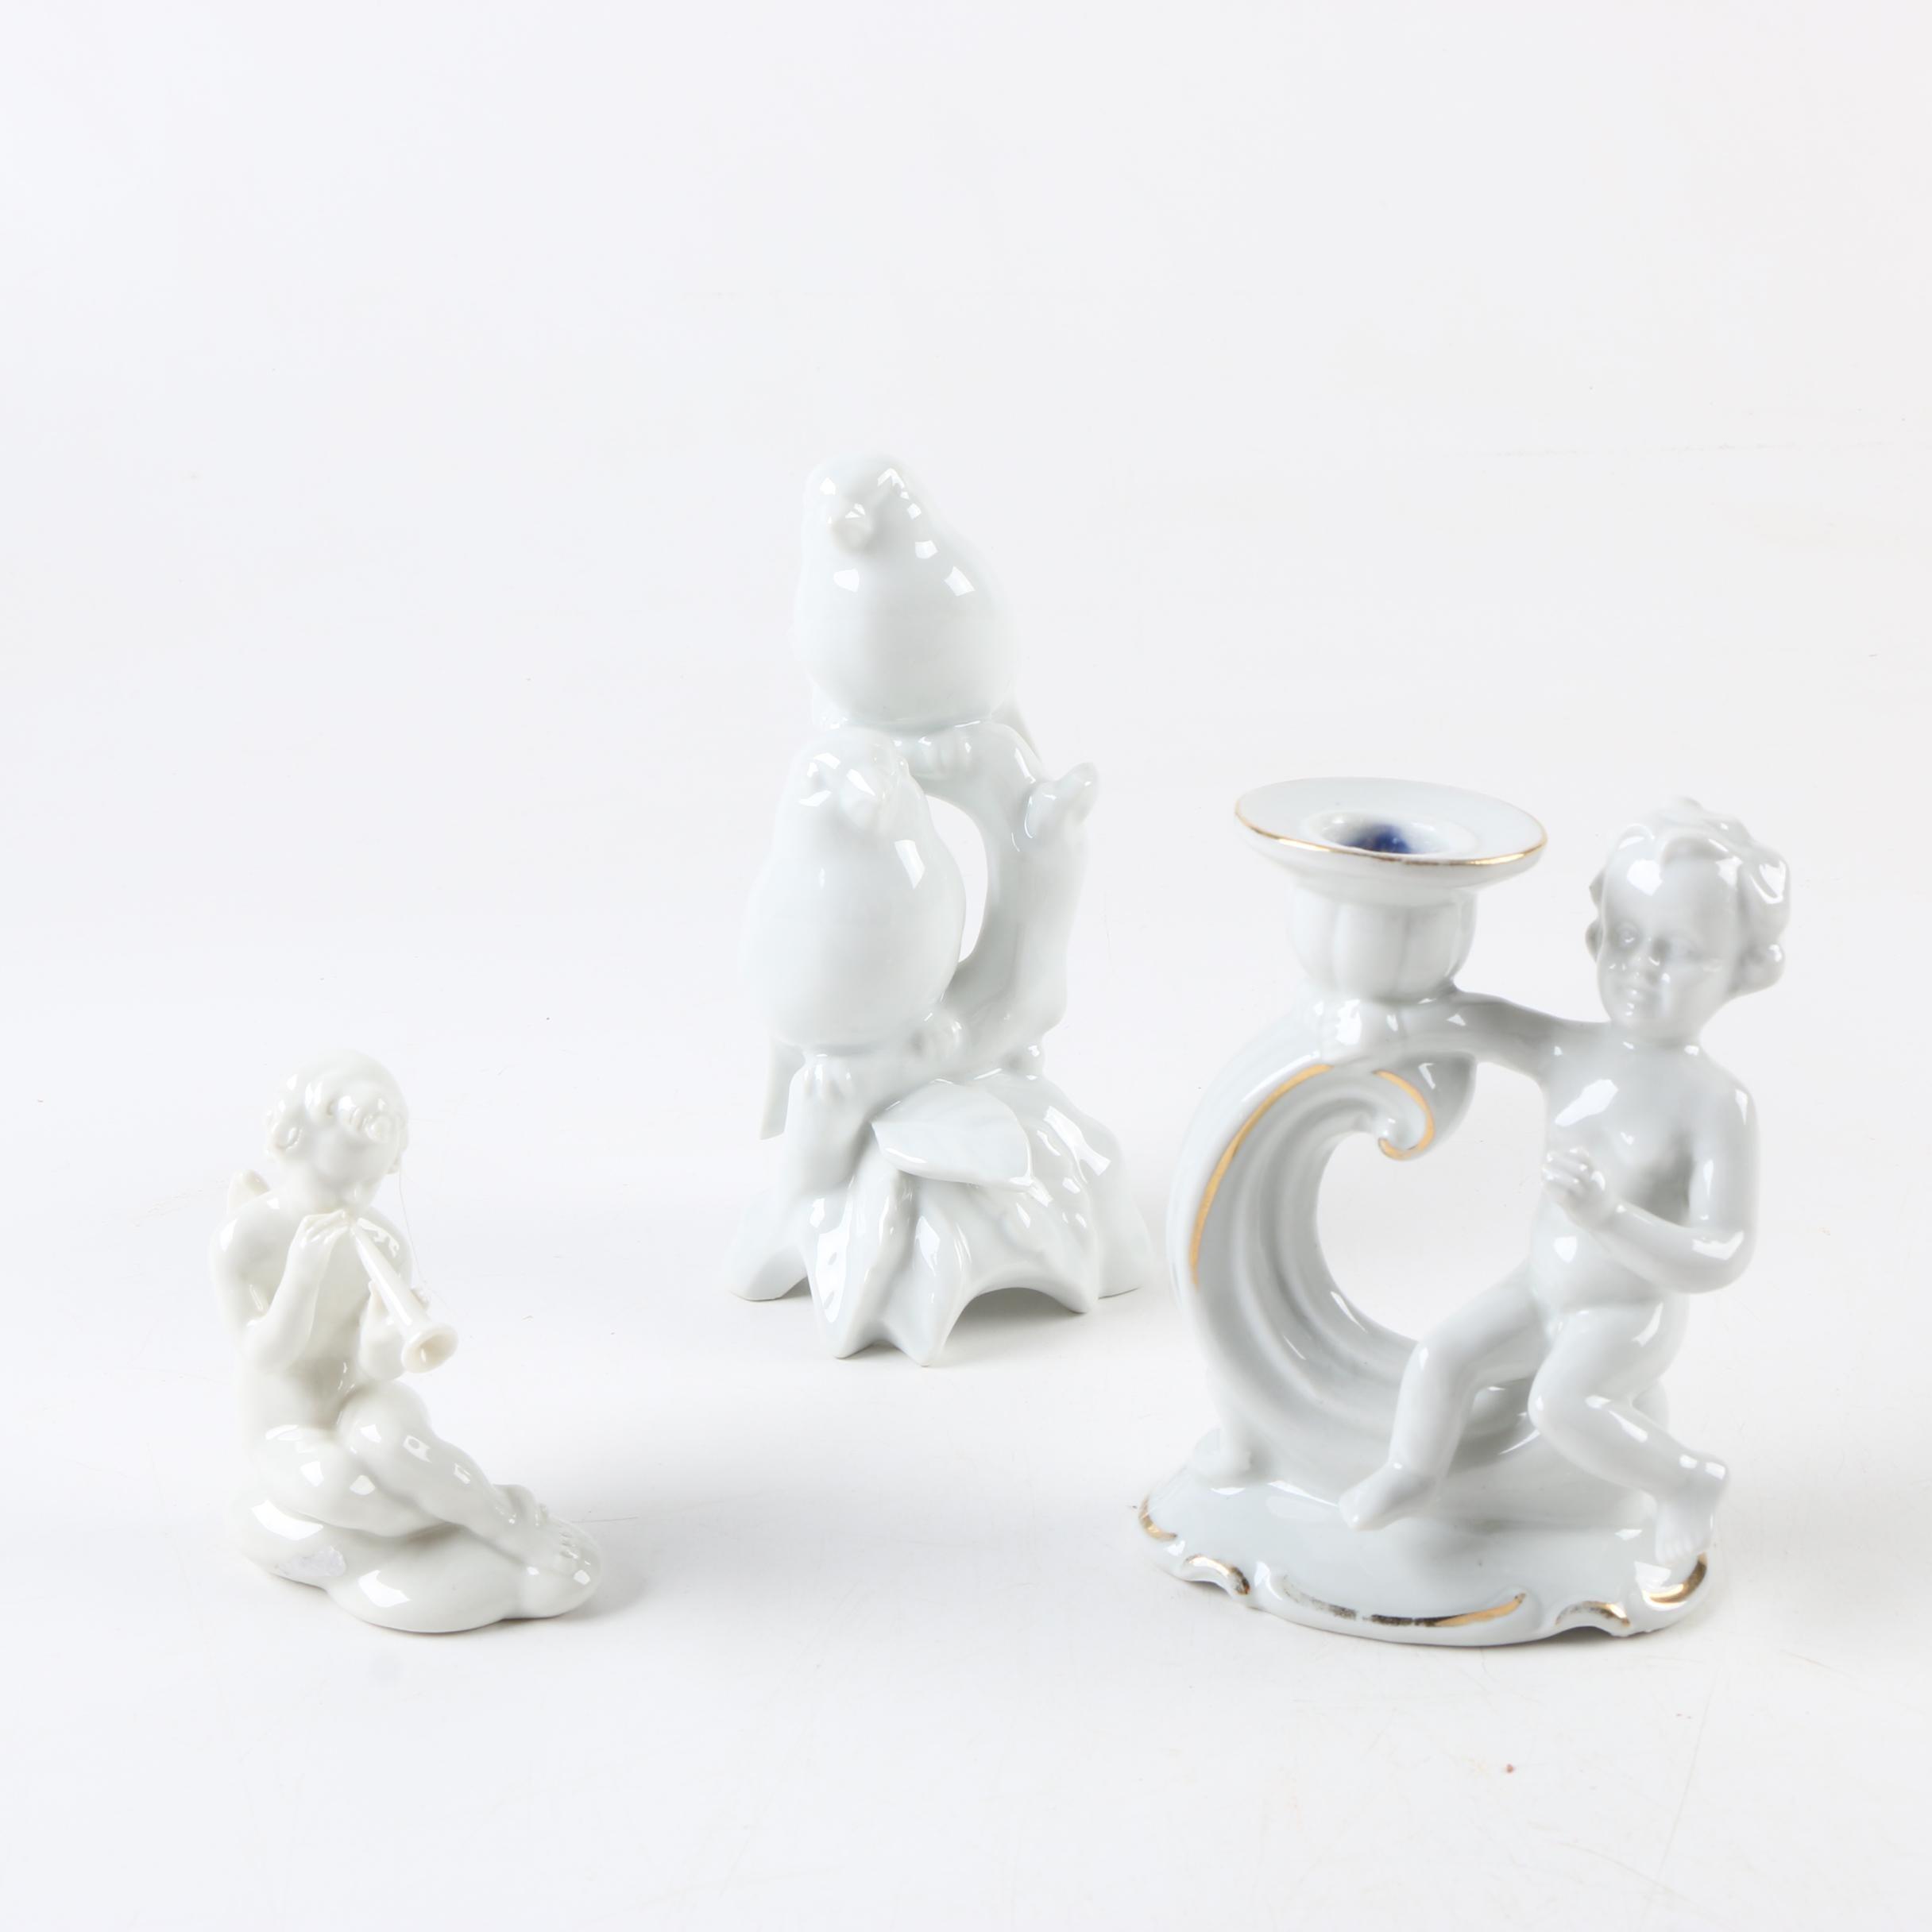 Porcelain Cherub and Bird Motif Figures with Candleholder